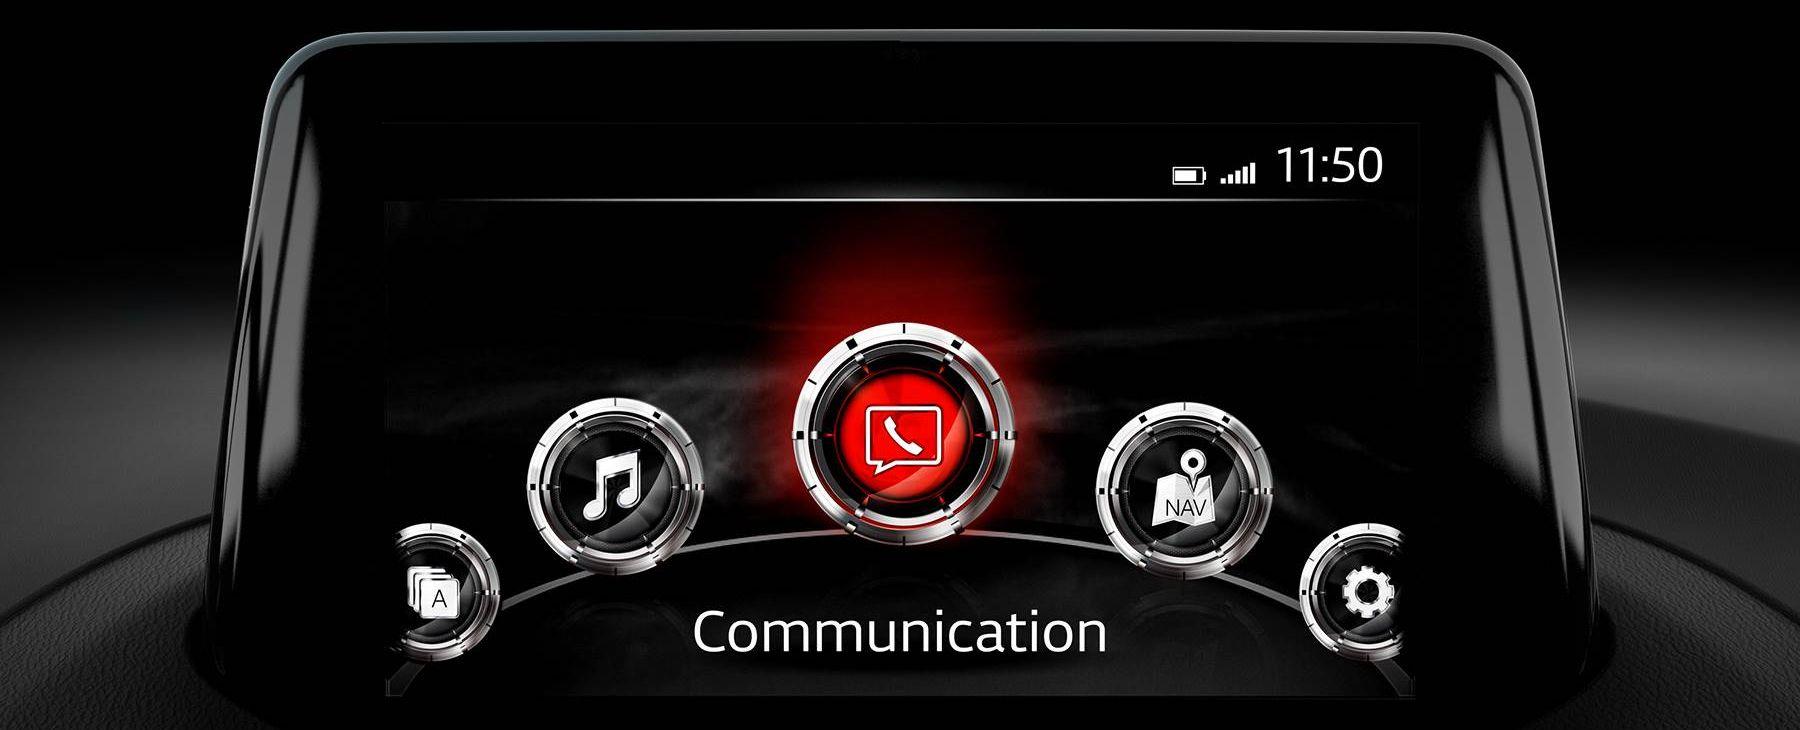 Mazda3 Touchscreen